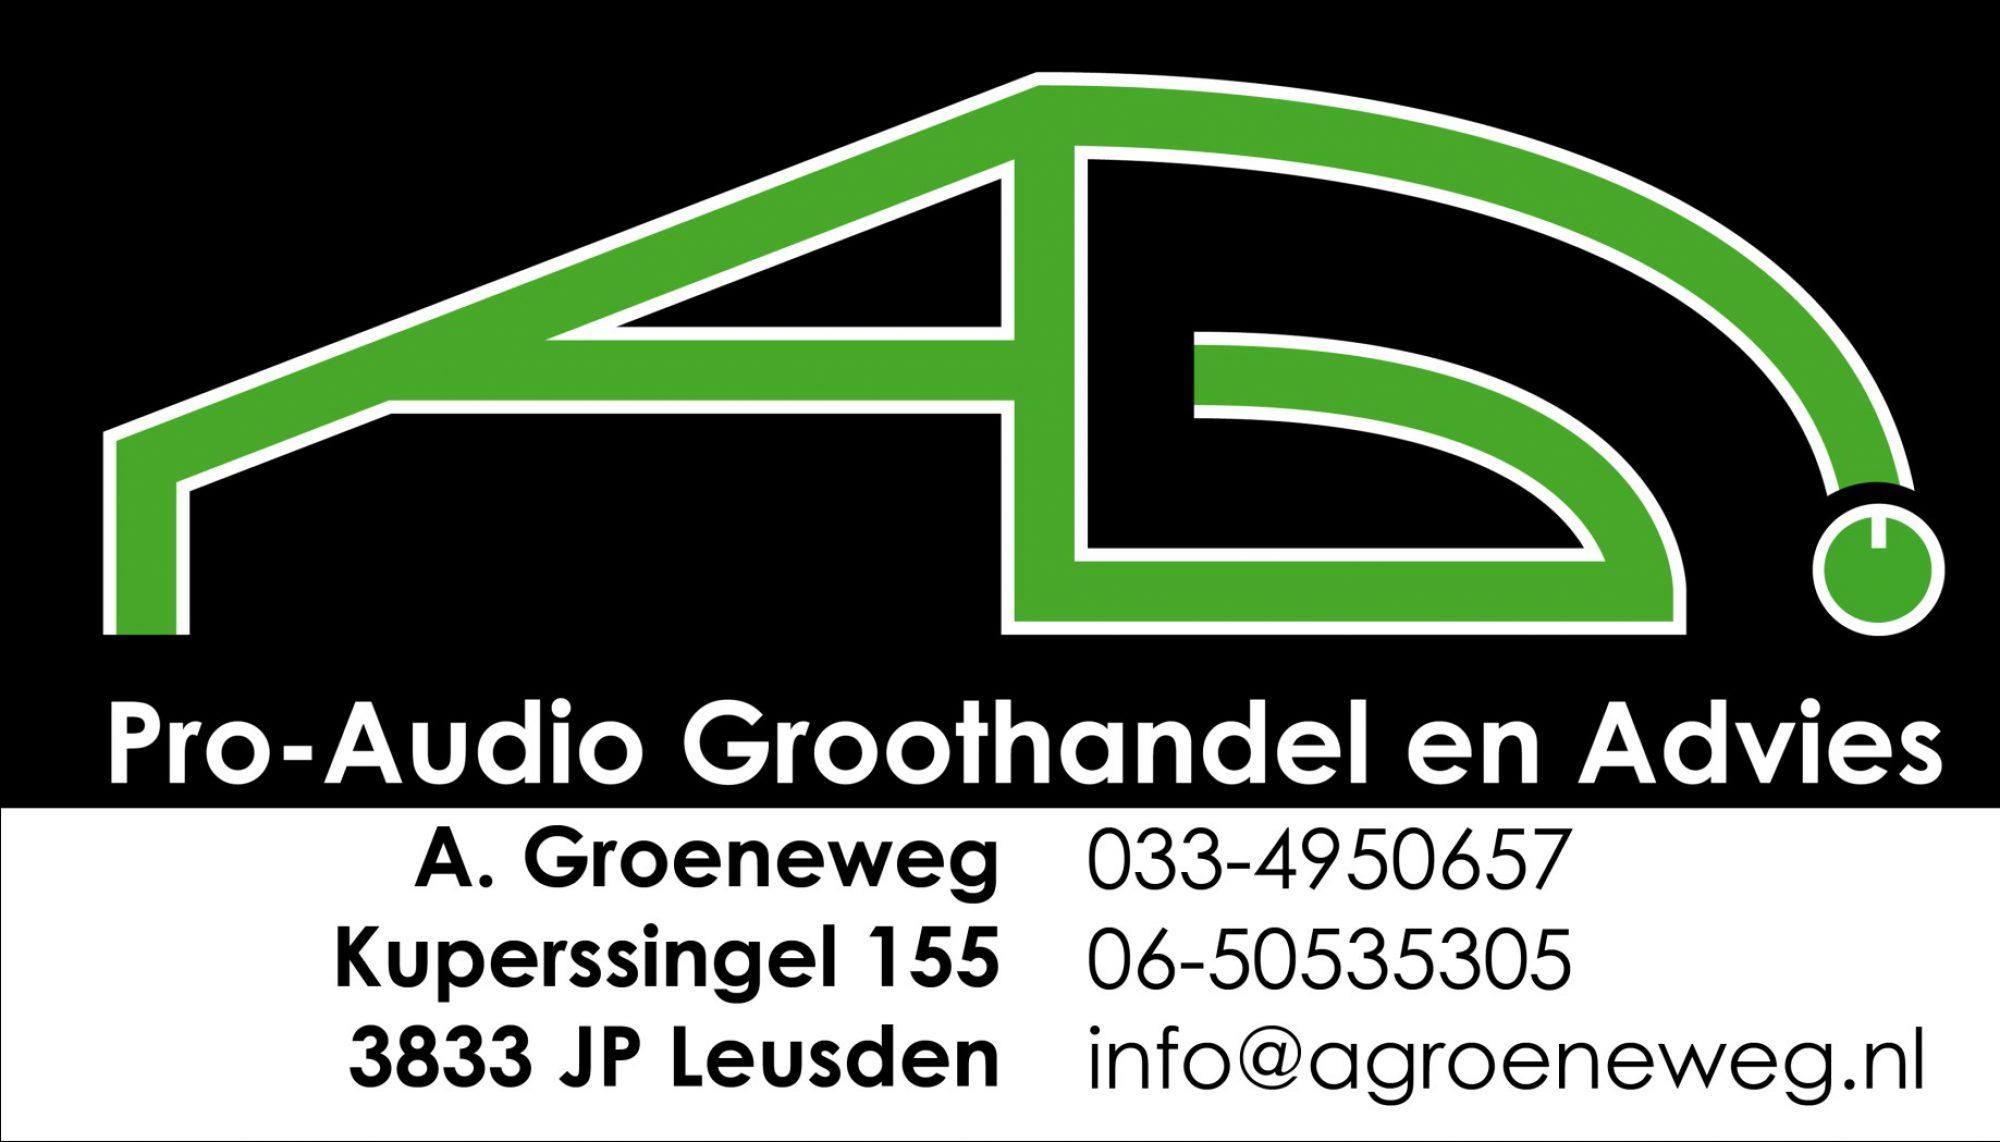 ag@agroeneweg.nl